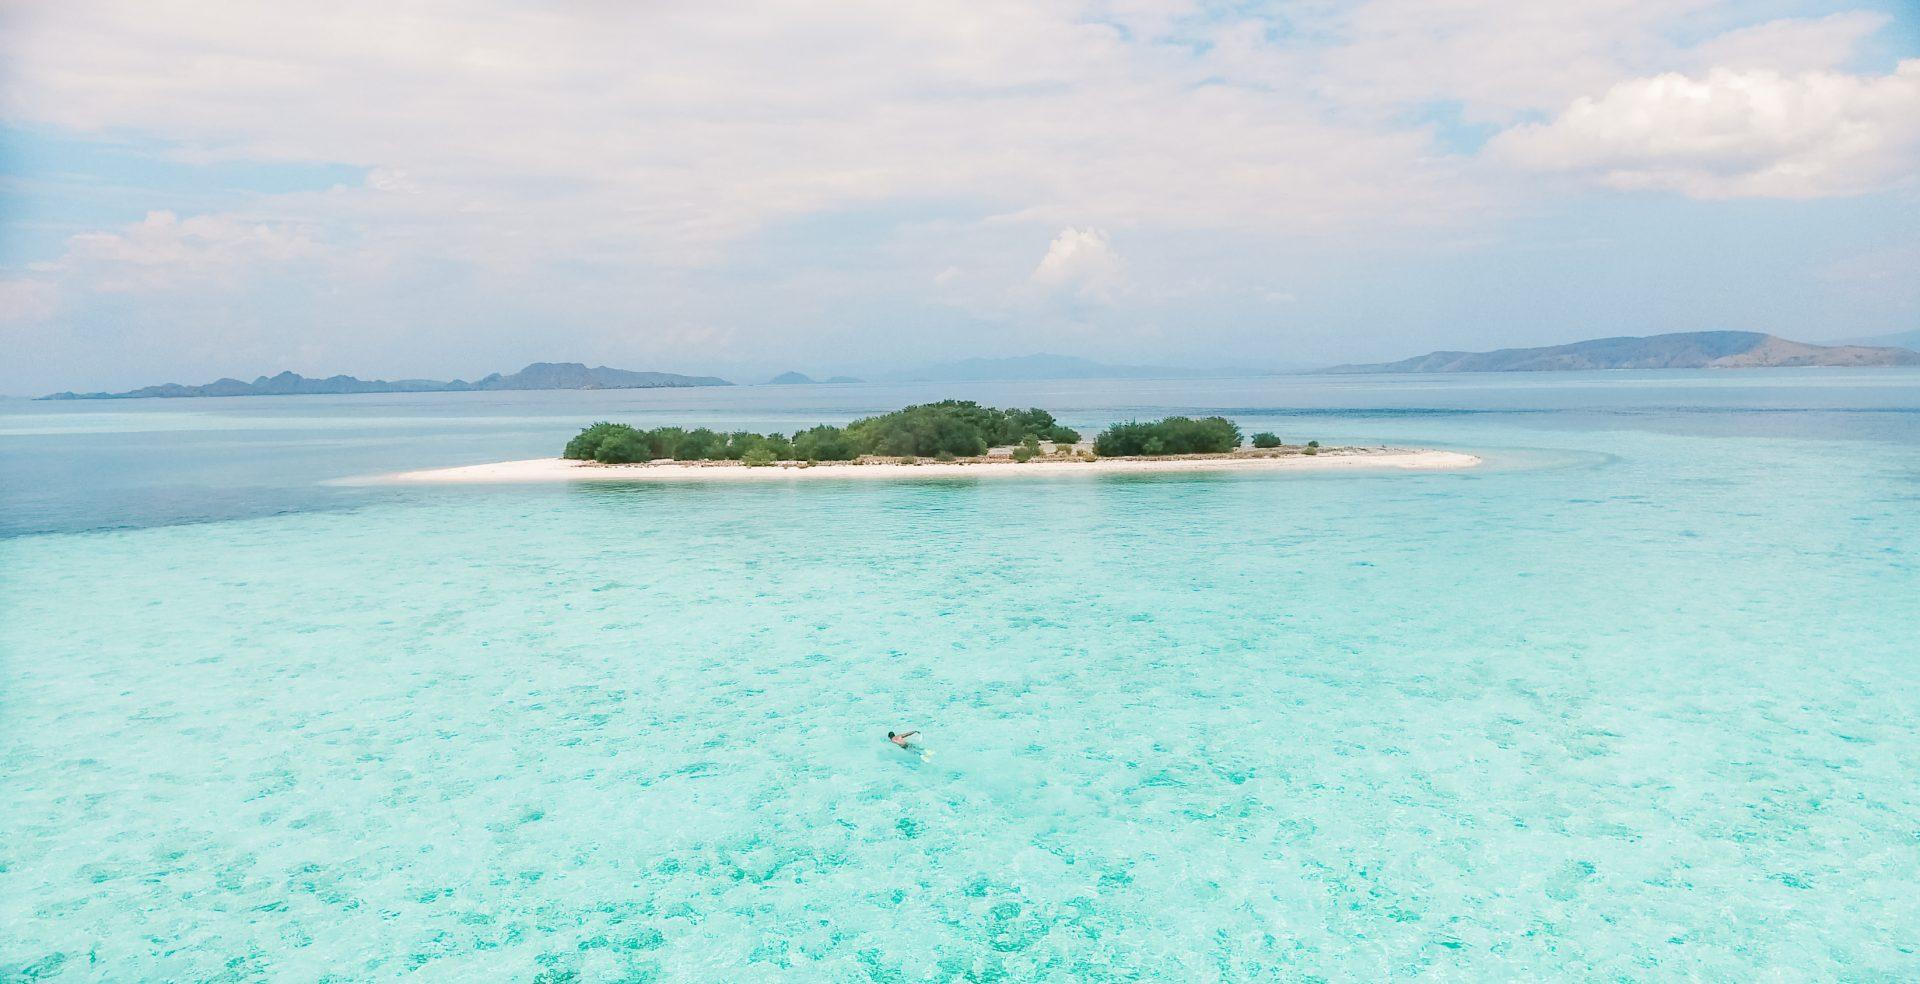 Viaje en barco de Komodo desde Lombok a Flores